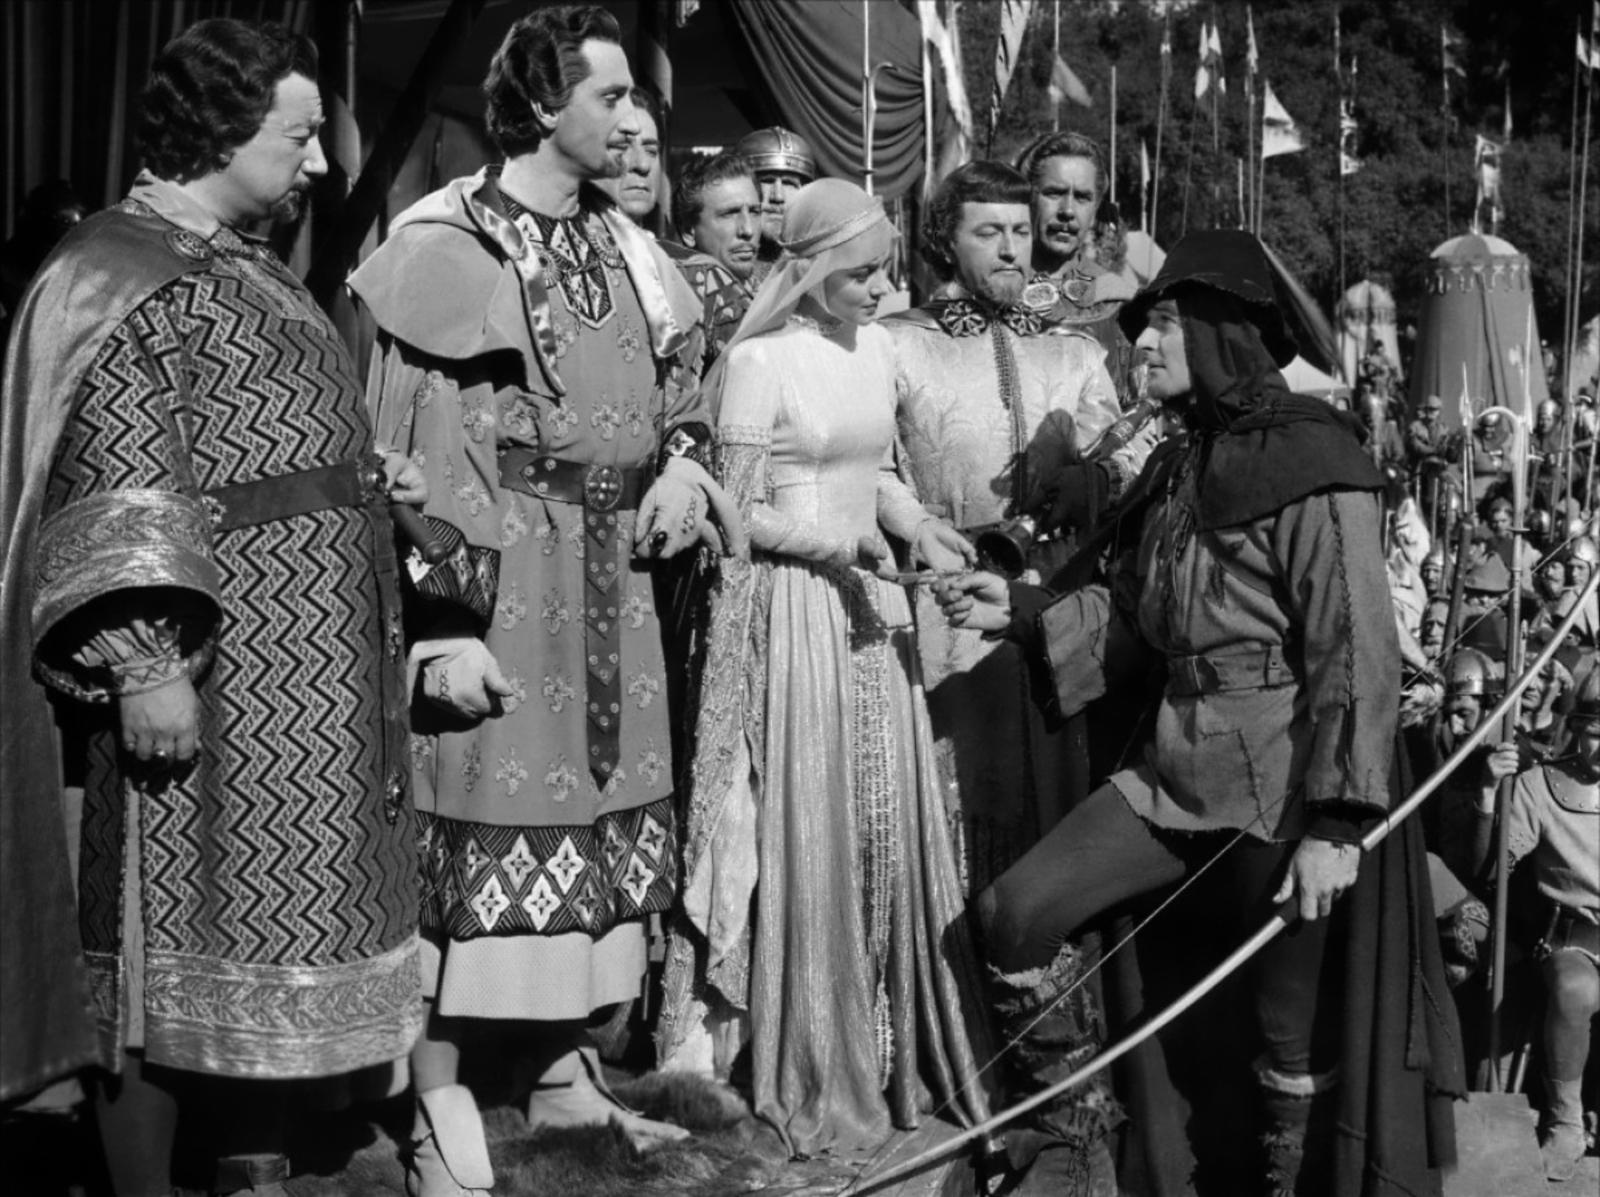 Melville Cooper, Basil Rathbone, Olivia de Havilland, Claude Rains, Errol Flynn